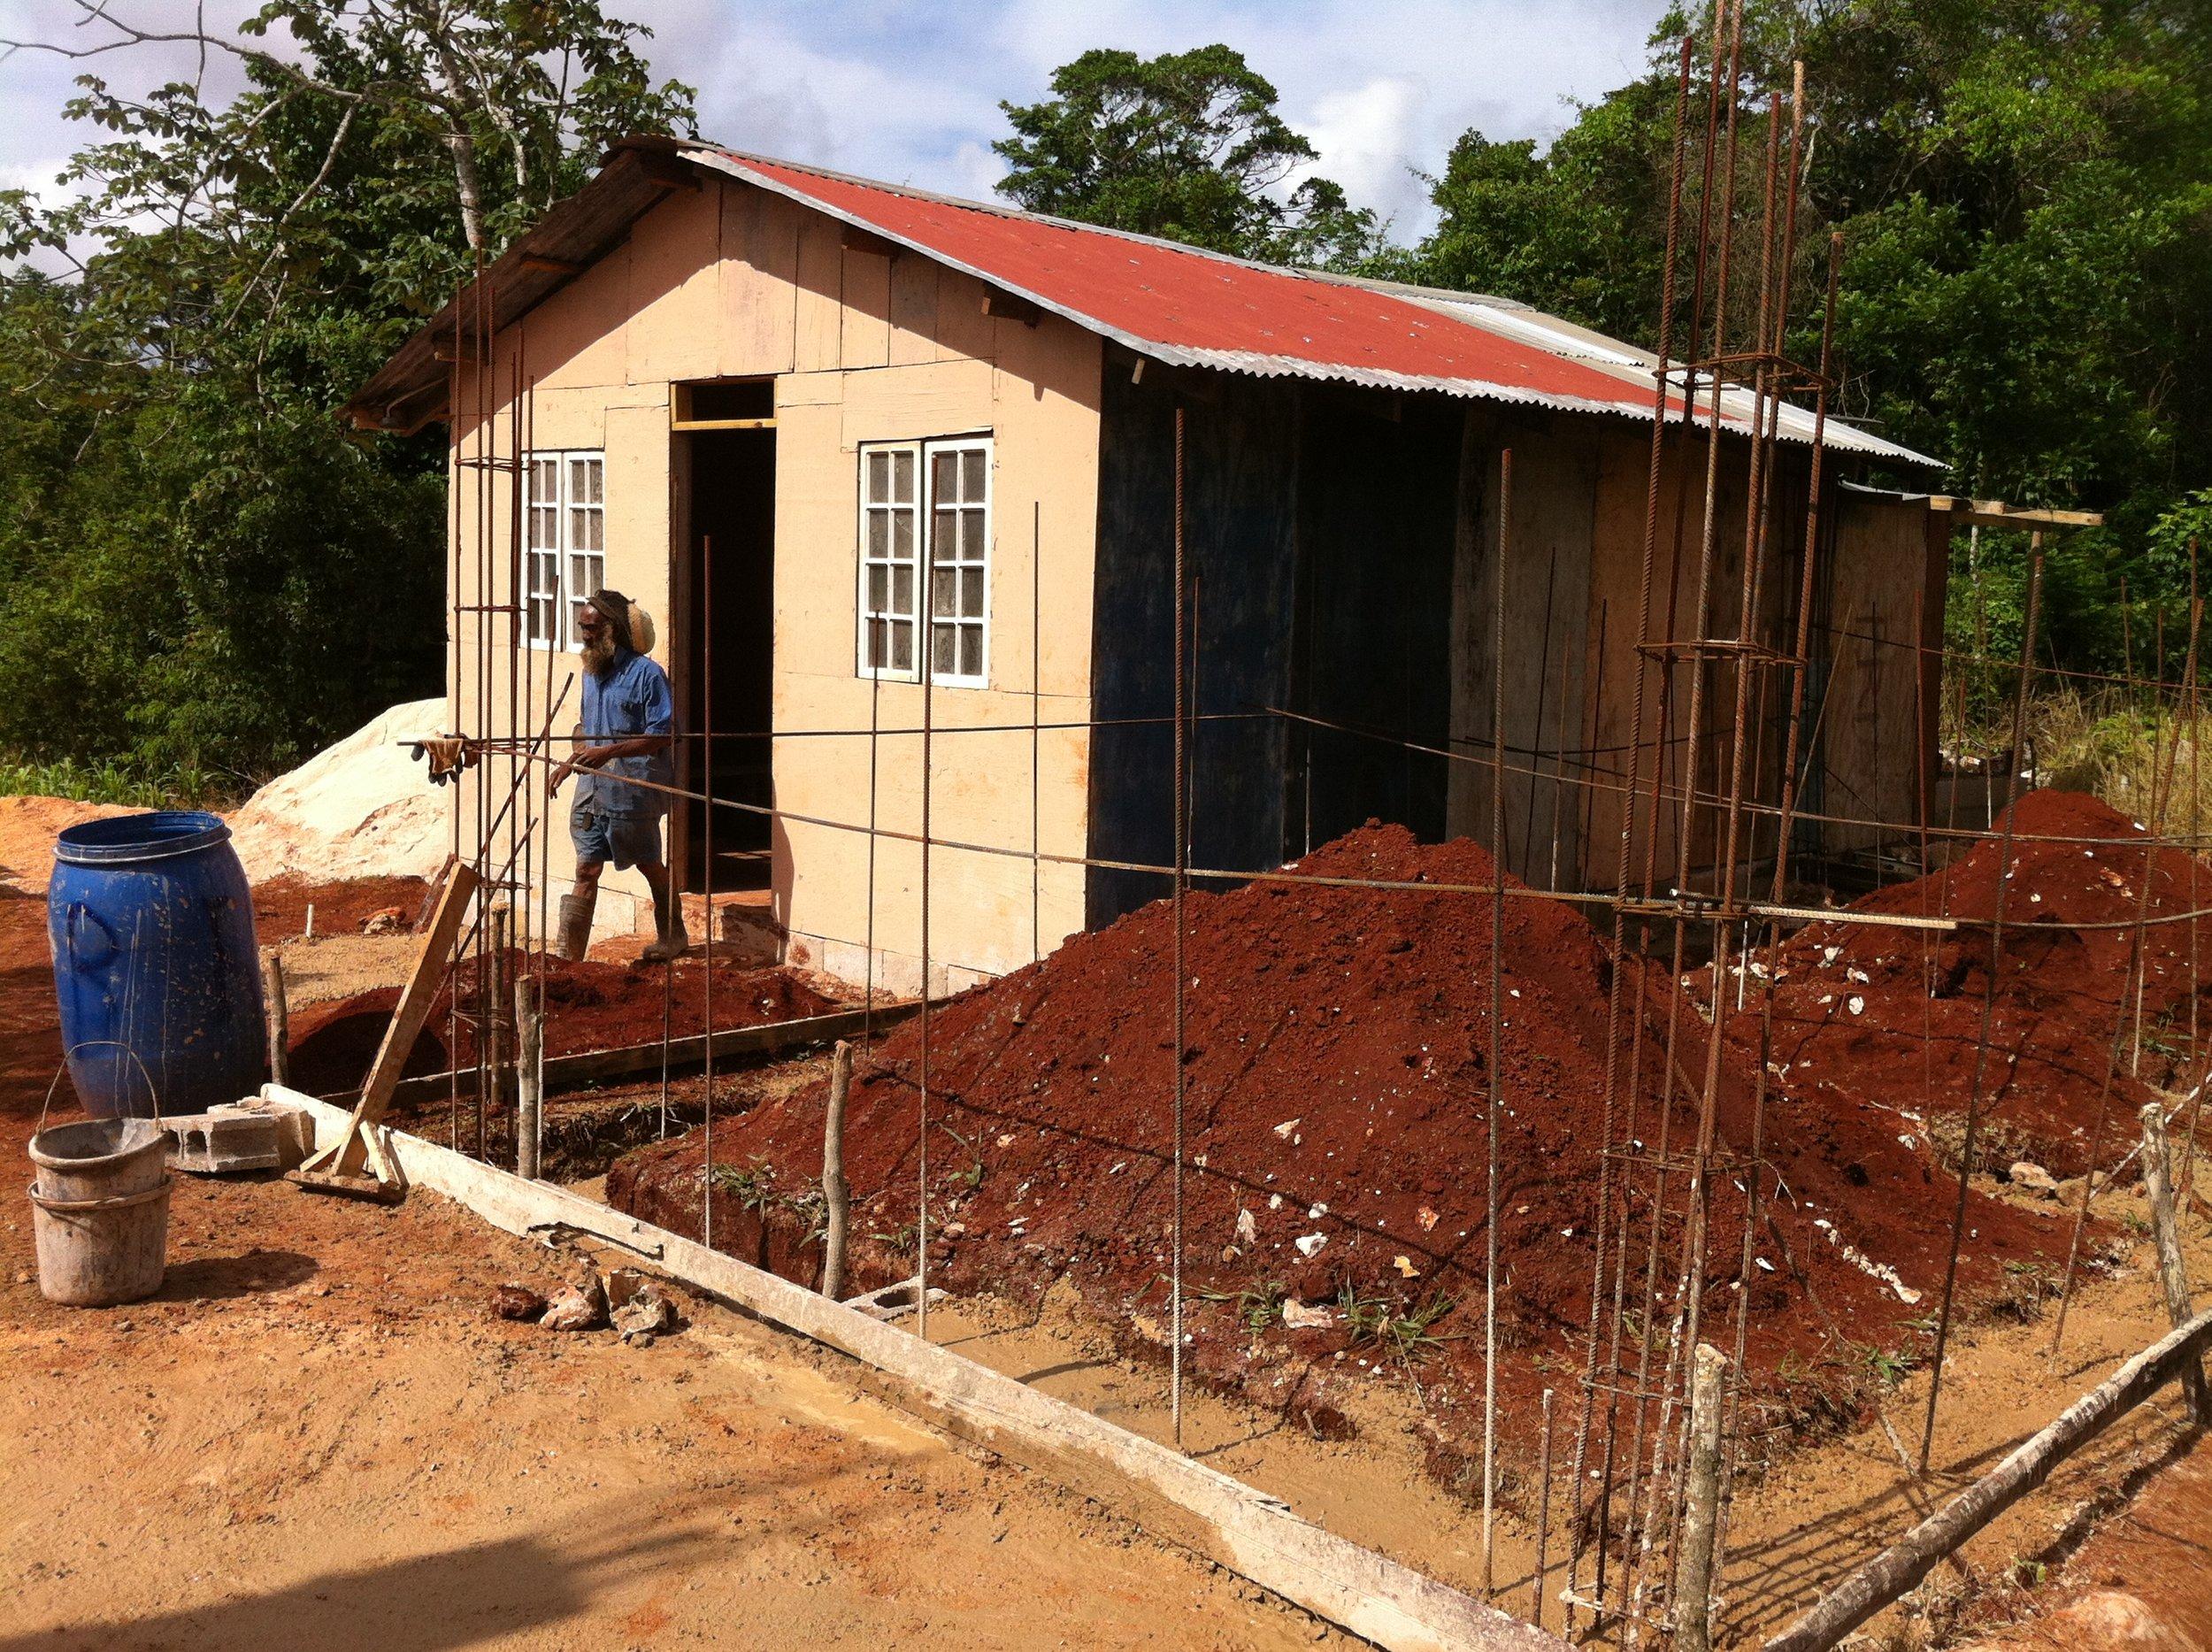 Jamaica 2012-06 After 1 day-c.jpg